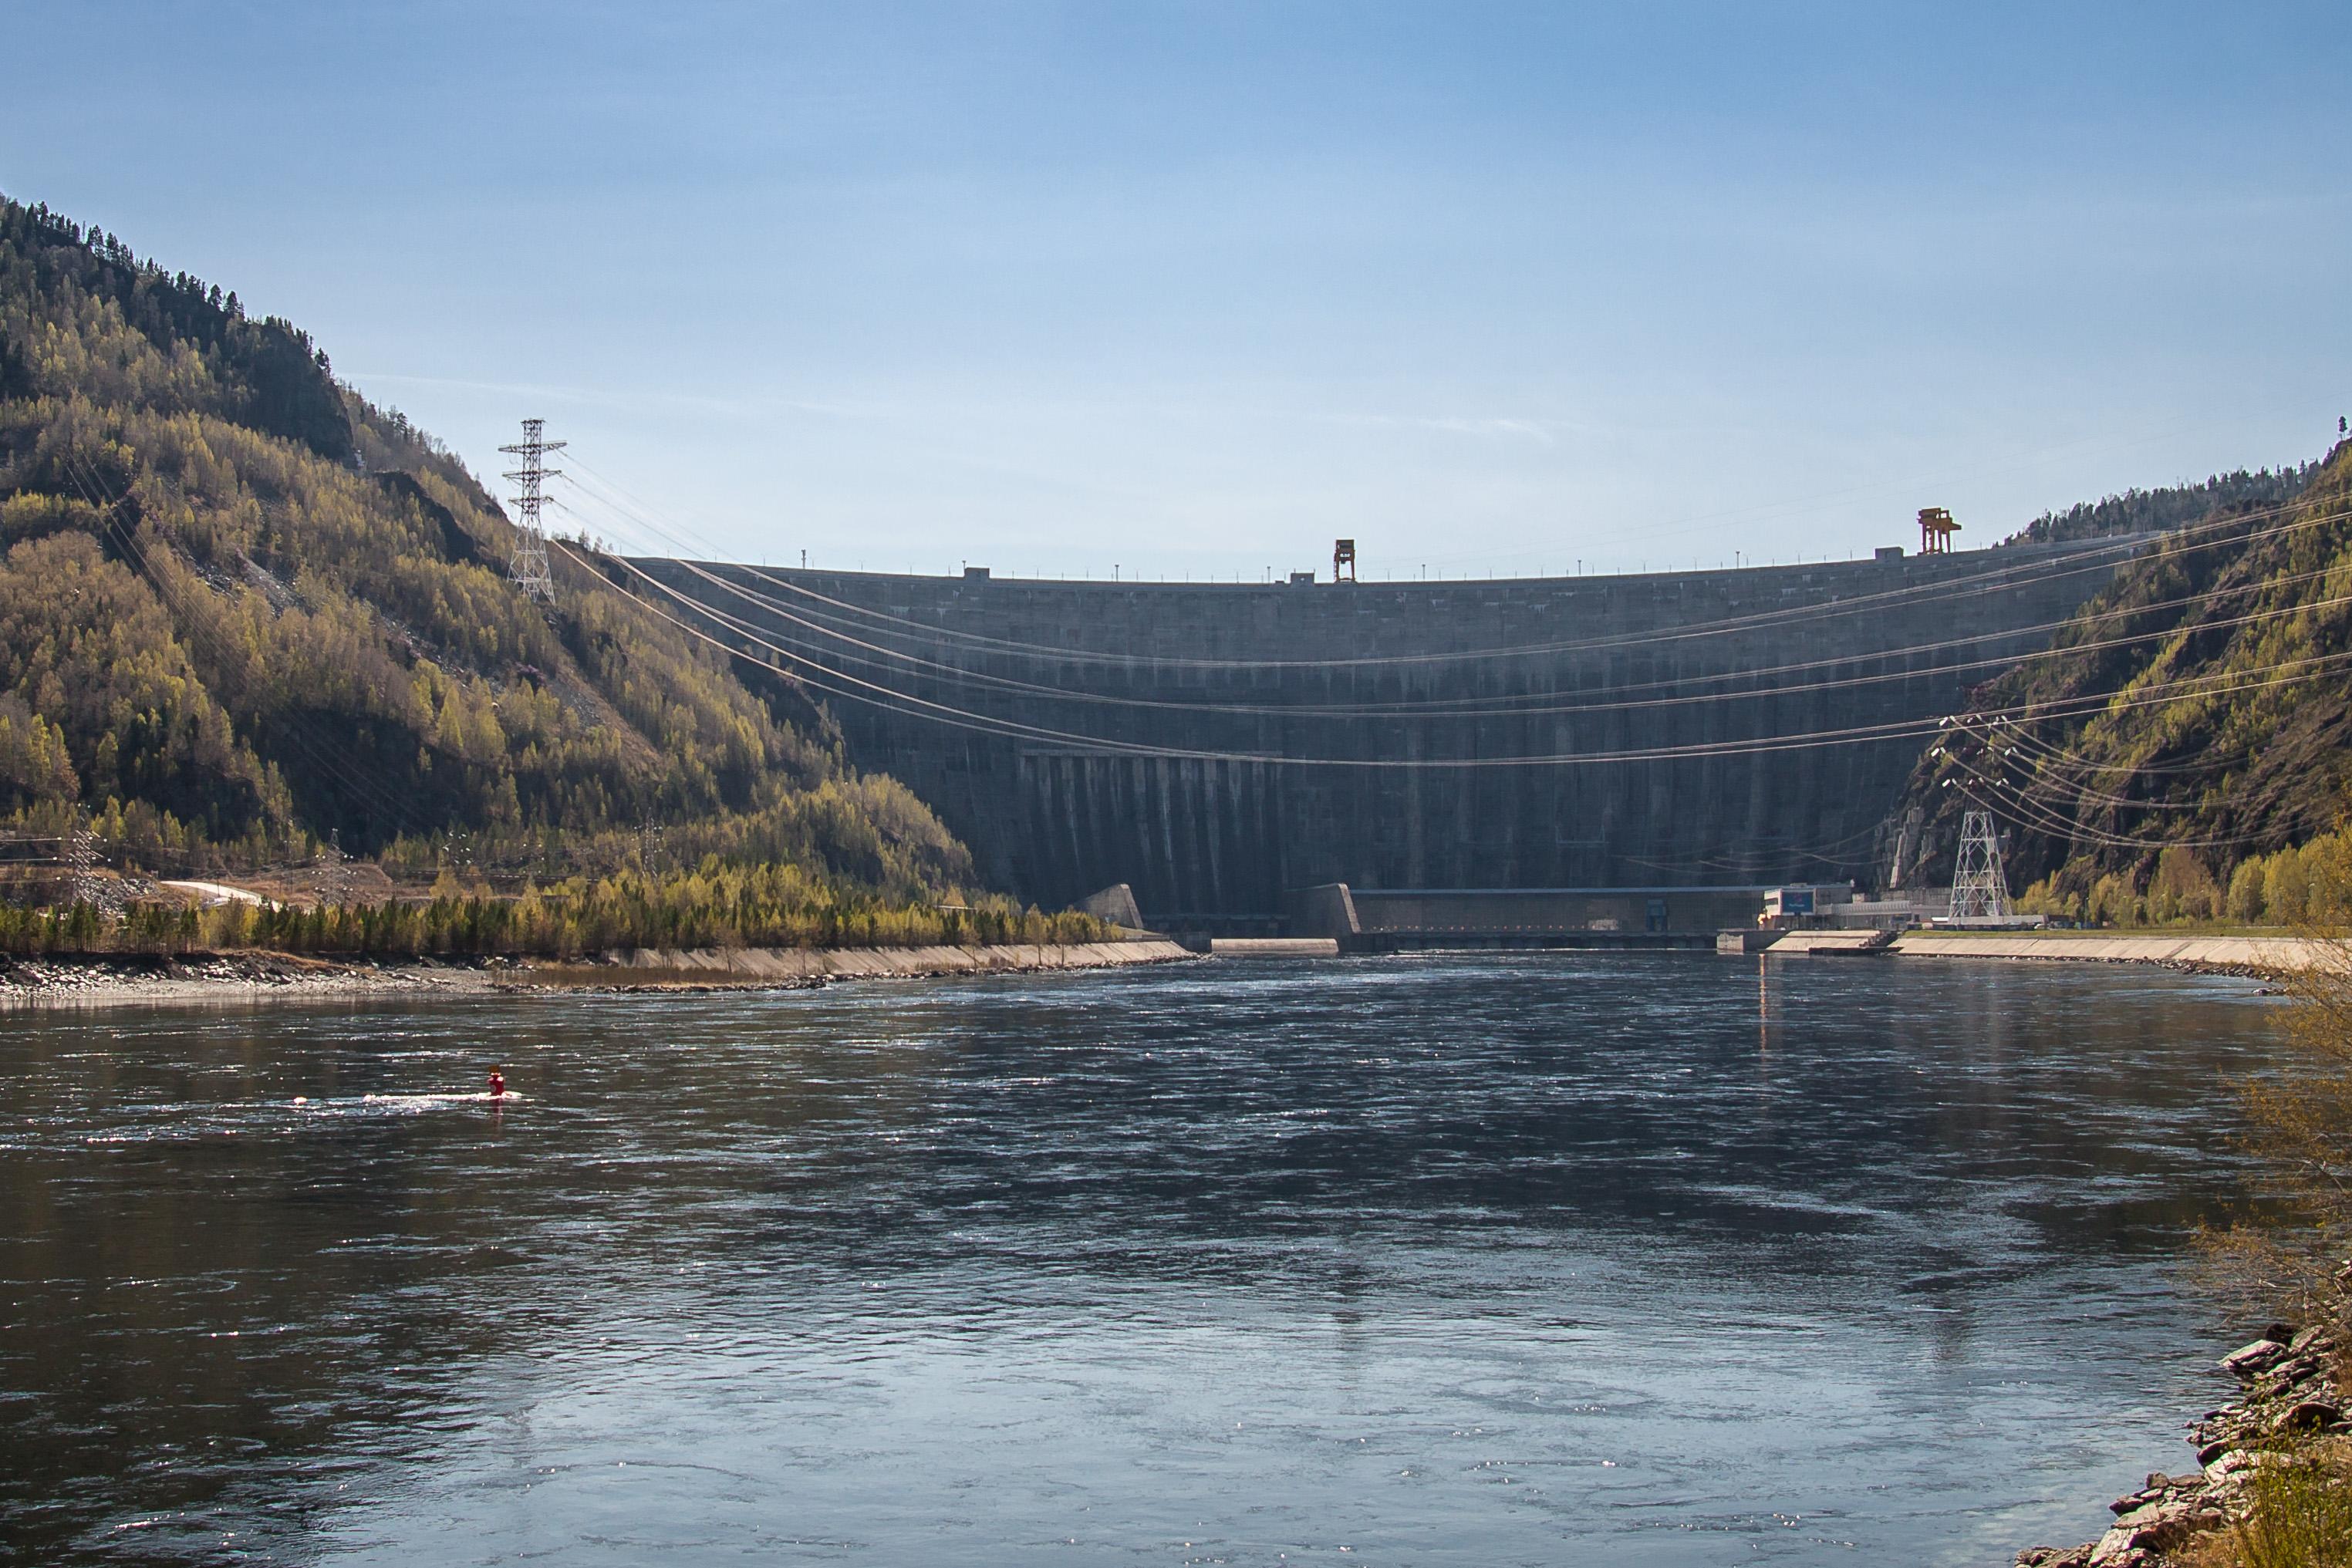 Sayano-Shushenskaya hydroelectric plant